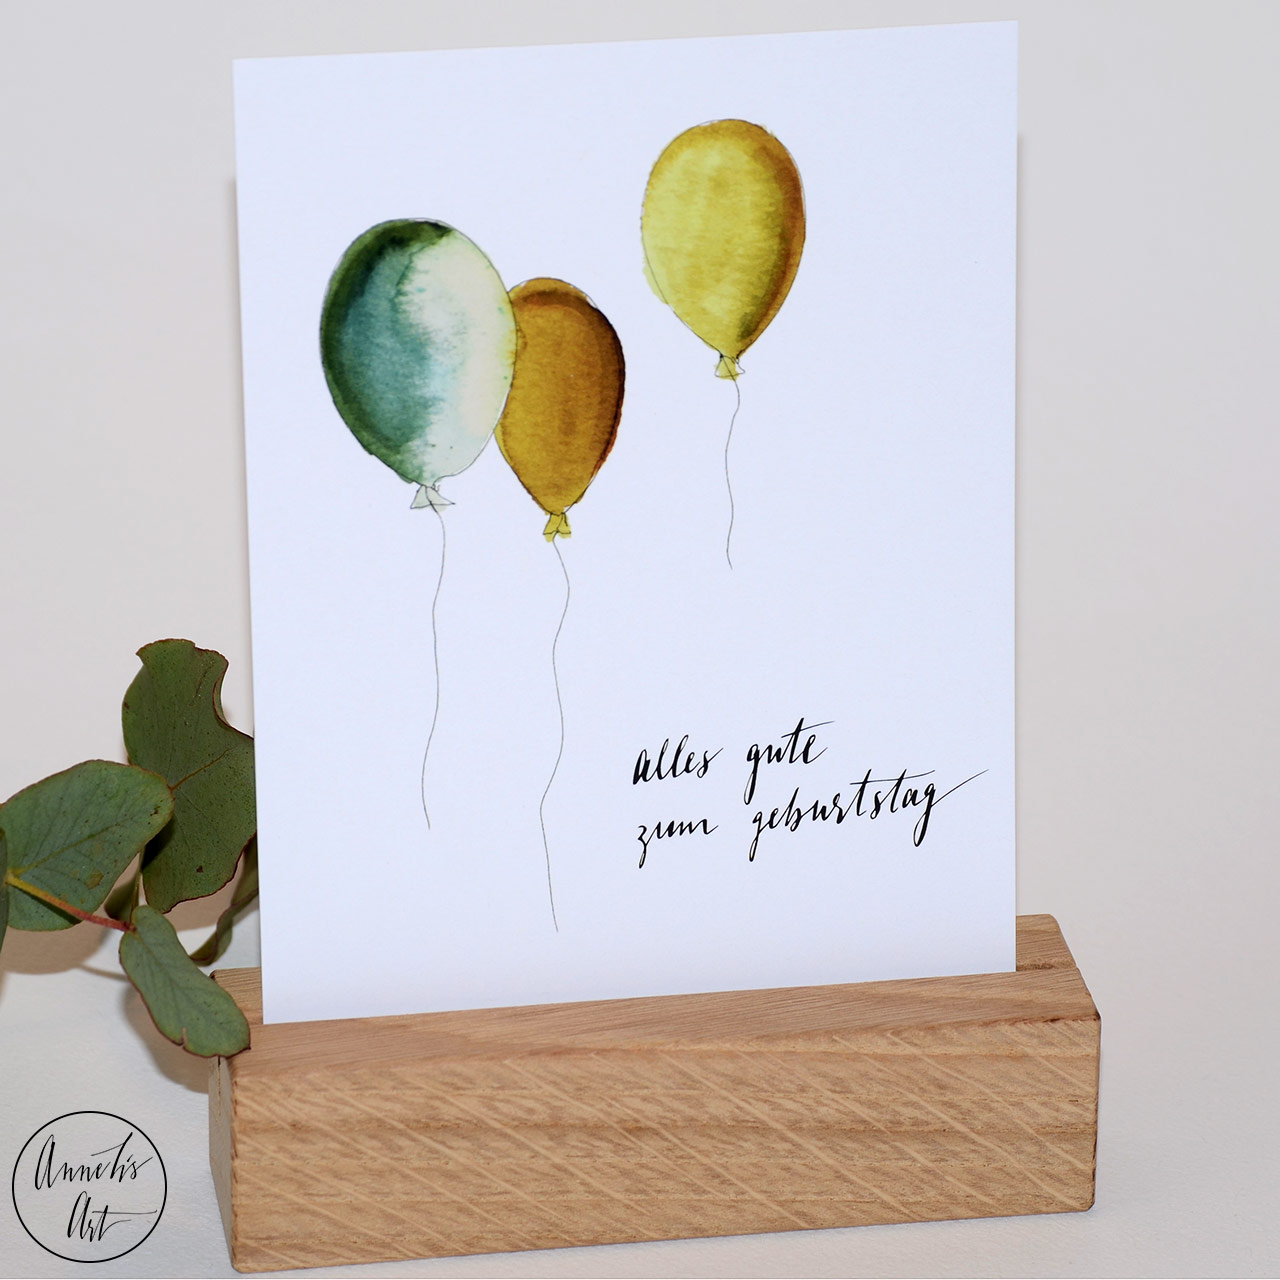 Postkarte | Geburtstagskarte | Geburtstag mit Ballons